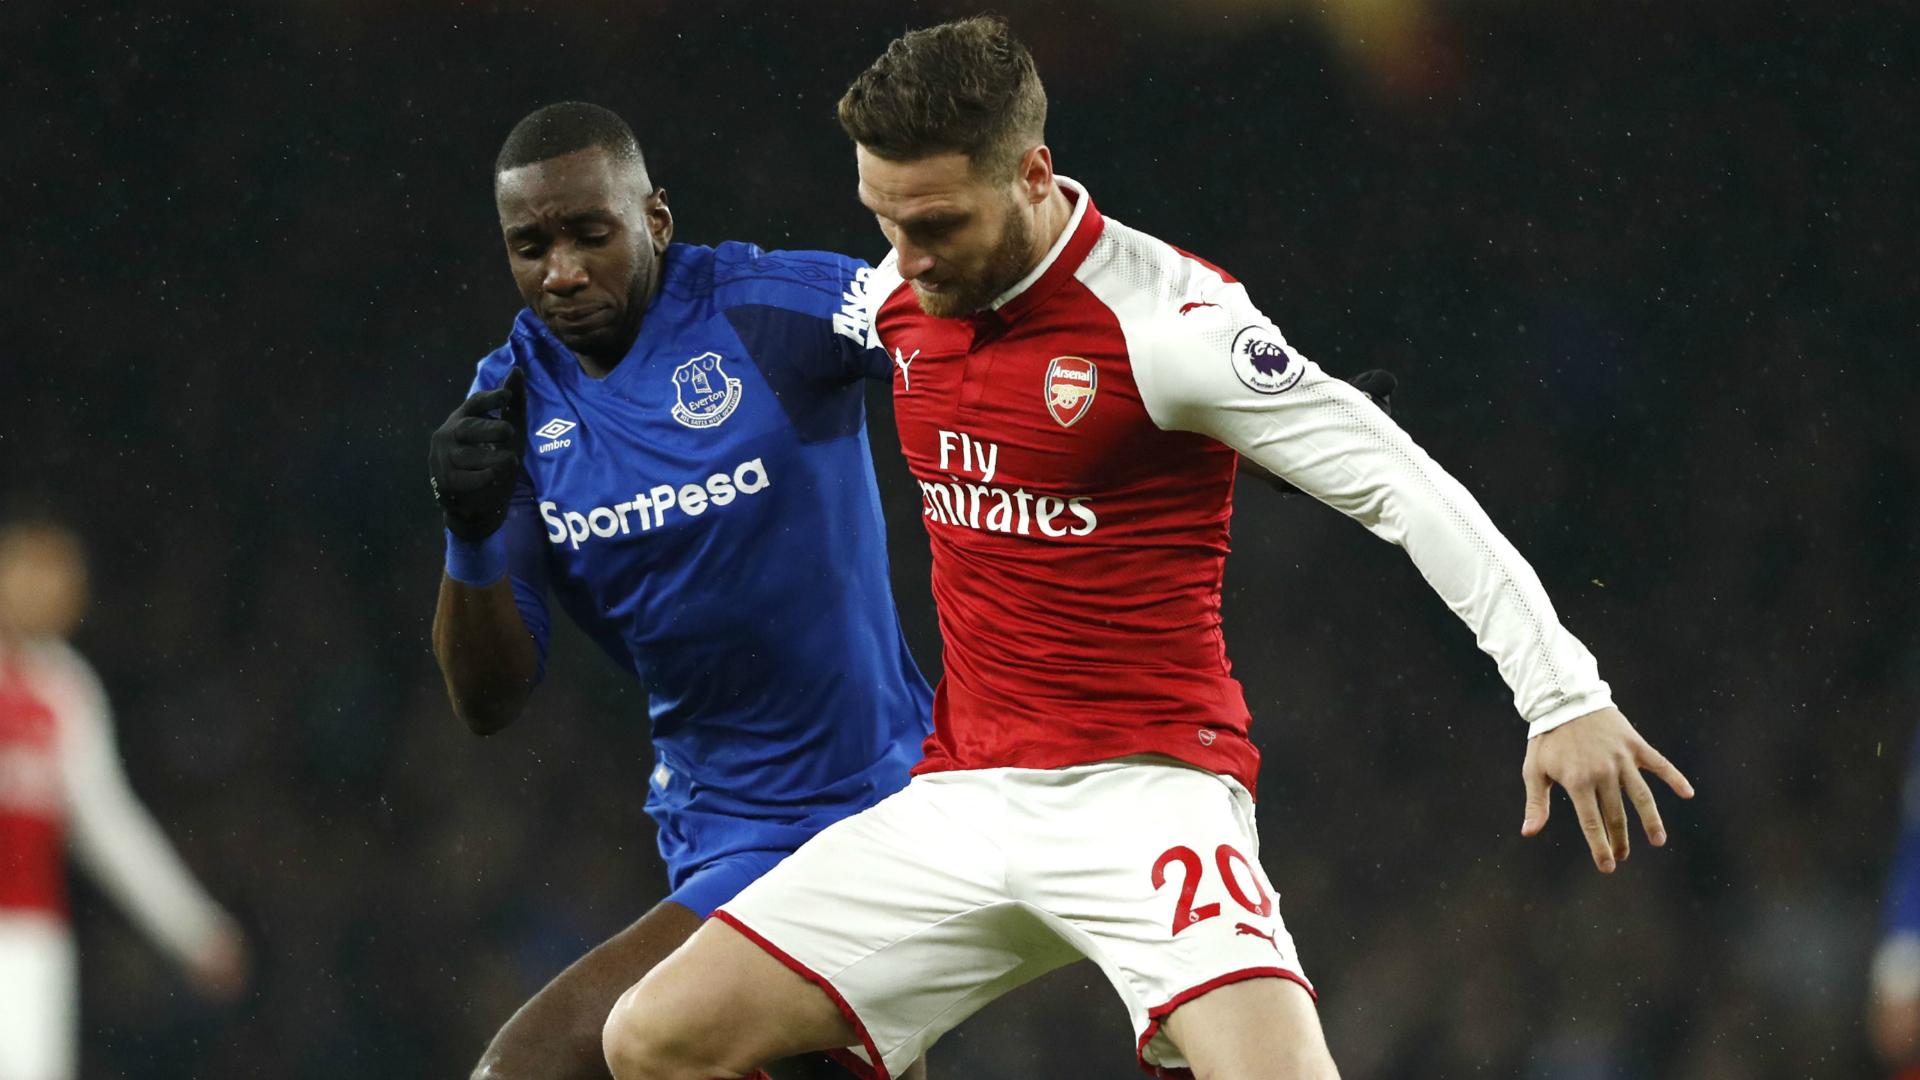 Arsenal vs. Everton